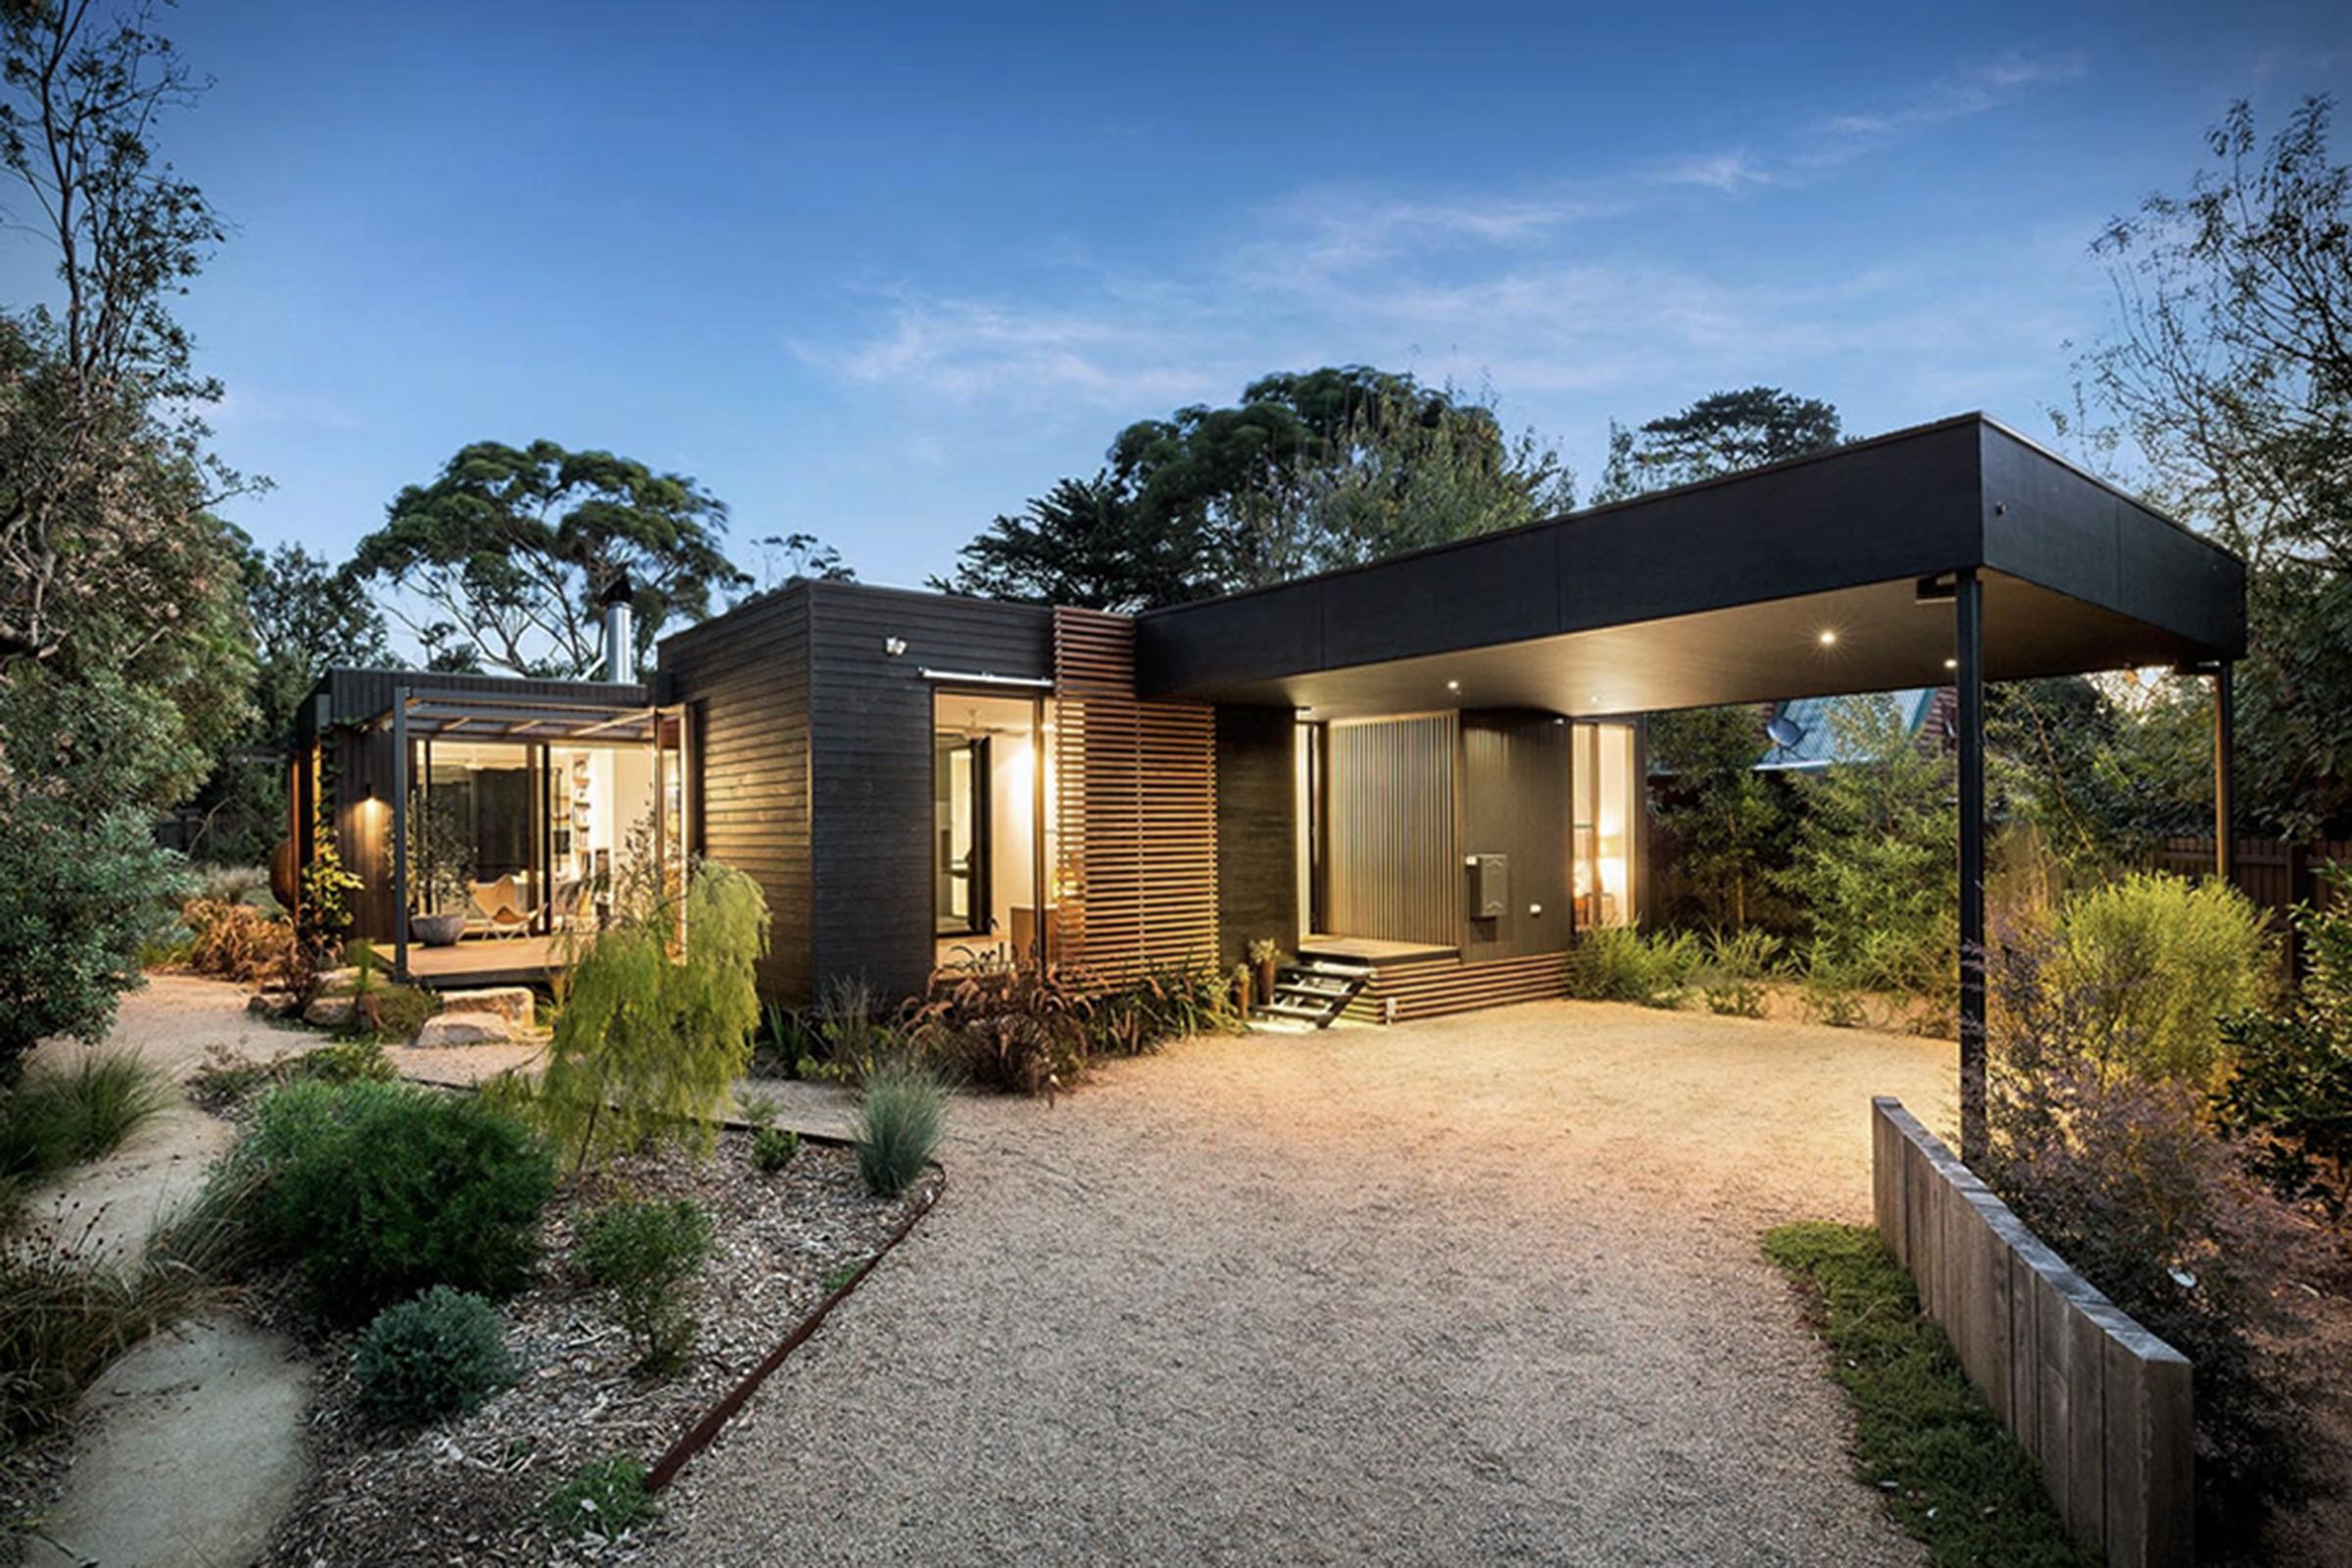 Vivienda modular en acero, arquitectura modular